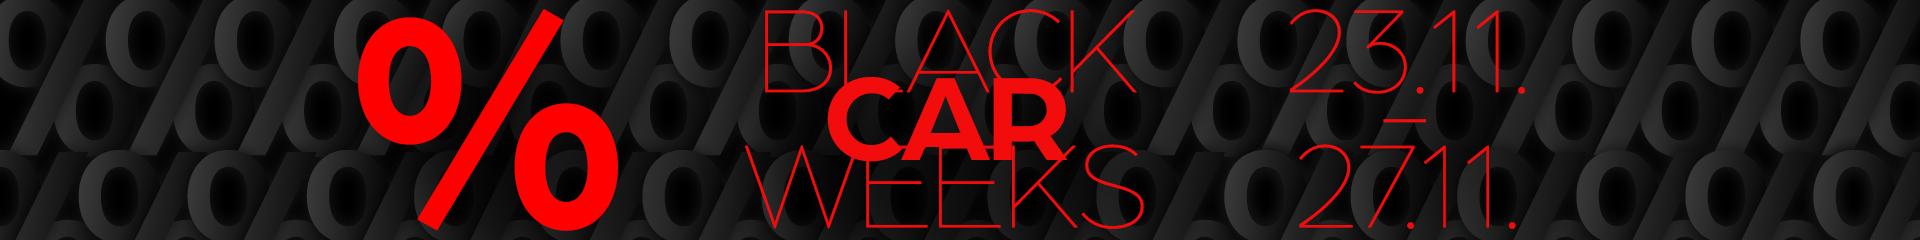 Black Car Week Autozentrum P&A-Preckel